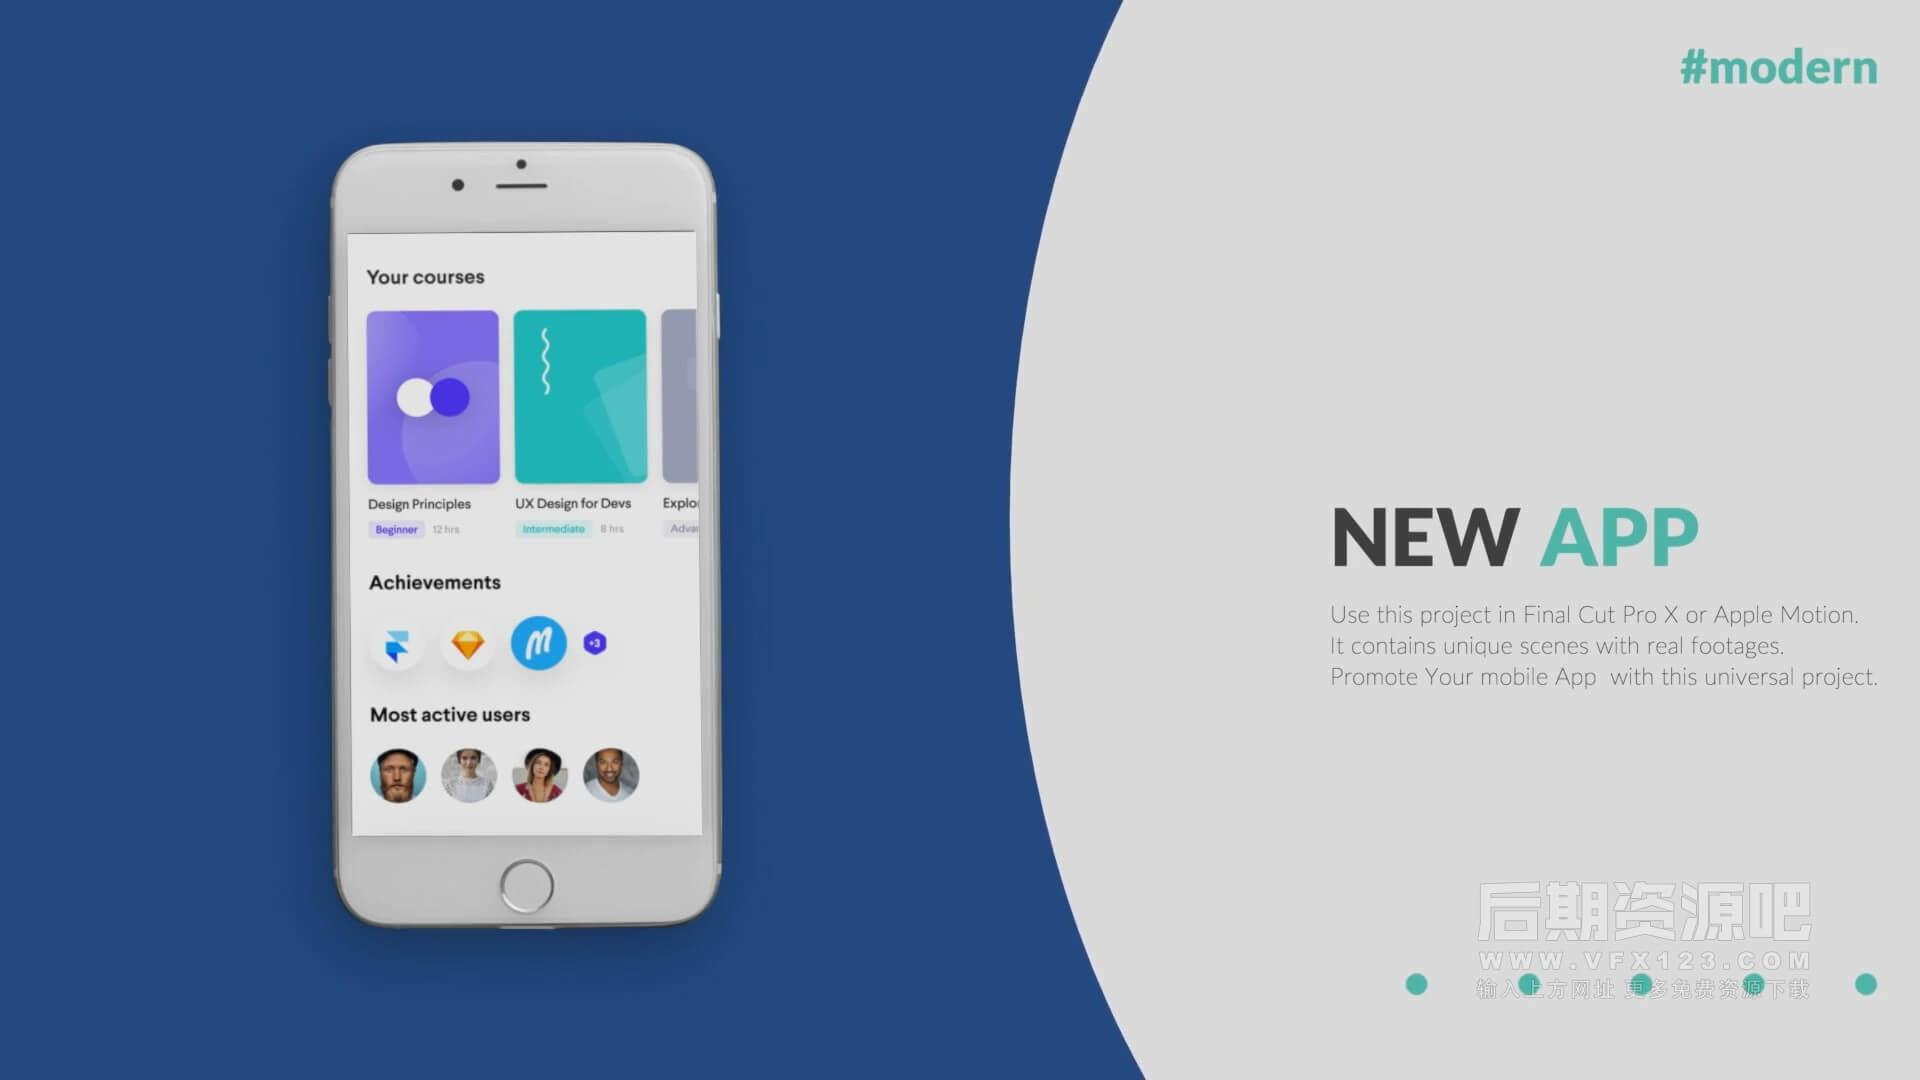 fcpx插件 苹果应用推广促销演示场景样机模板 Mobile App Promo